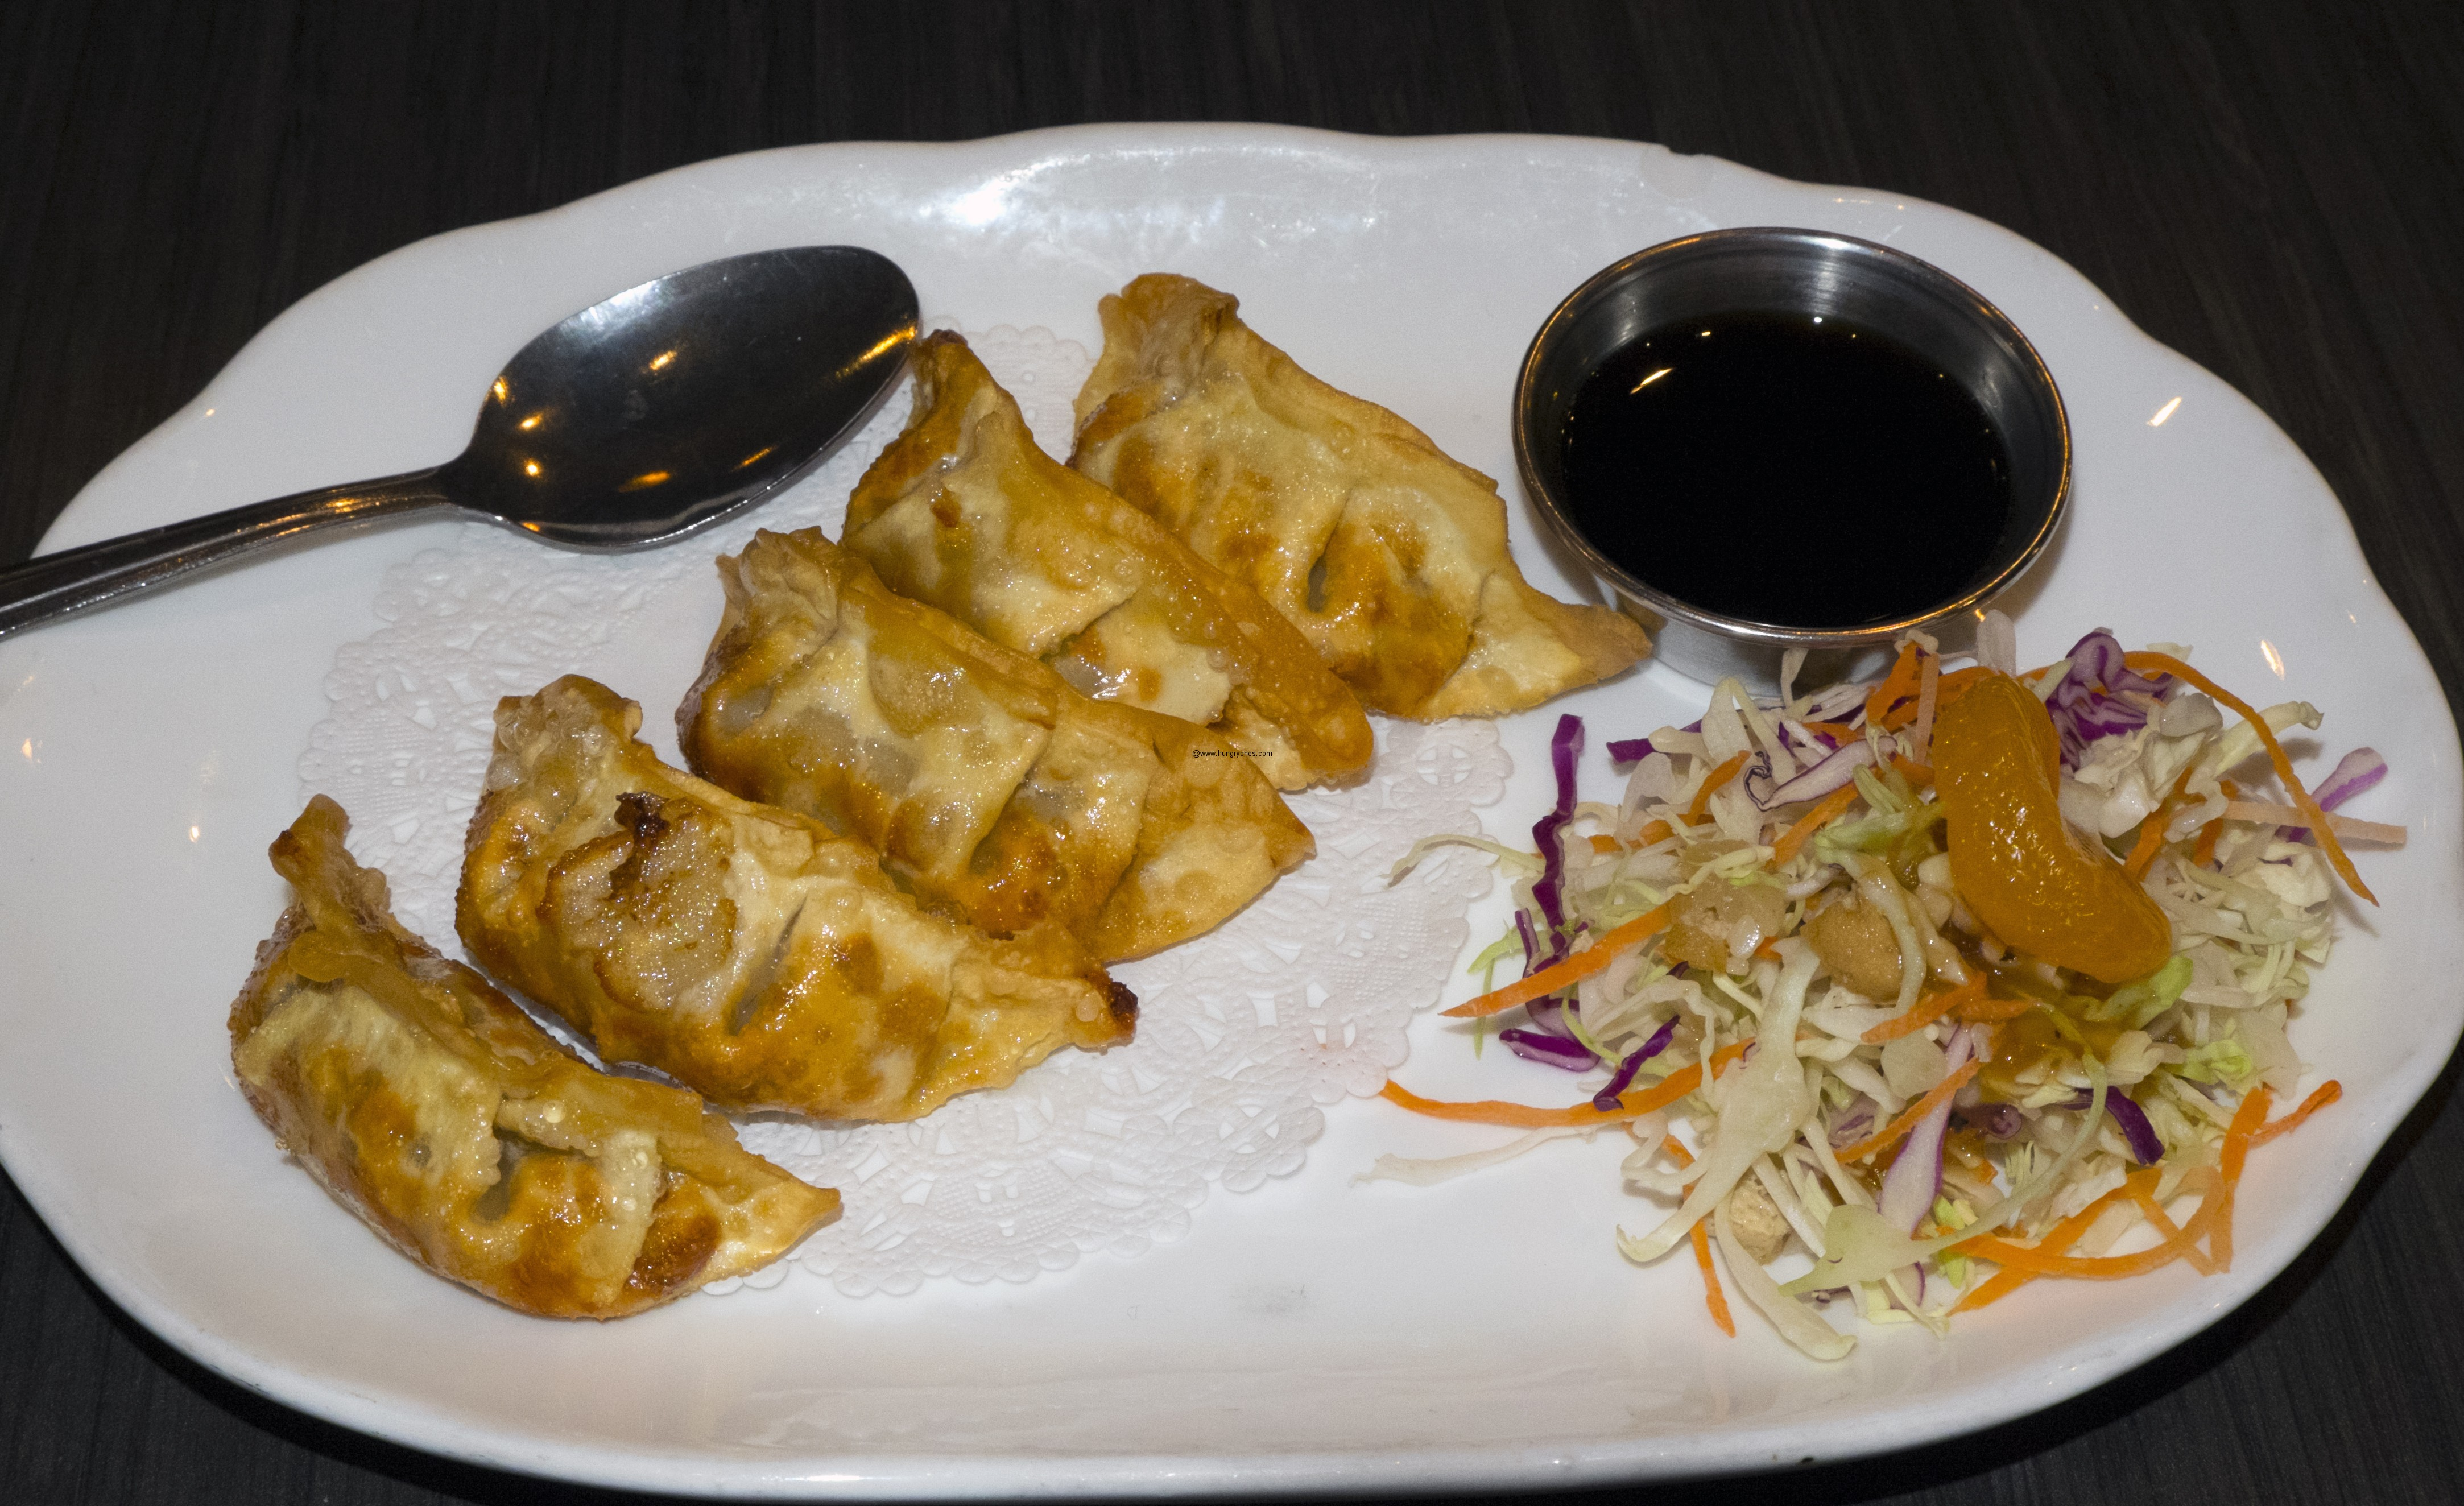 Jimmy Wong's Golden Dragon Asian Bistro | Hungryones.com